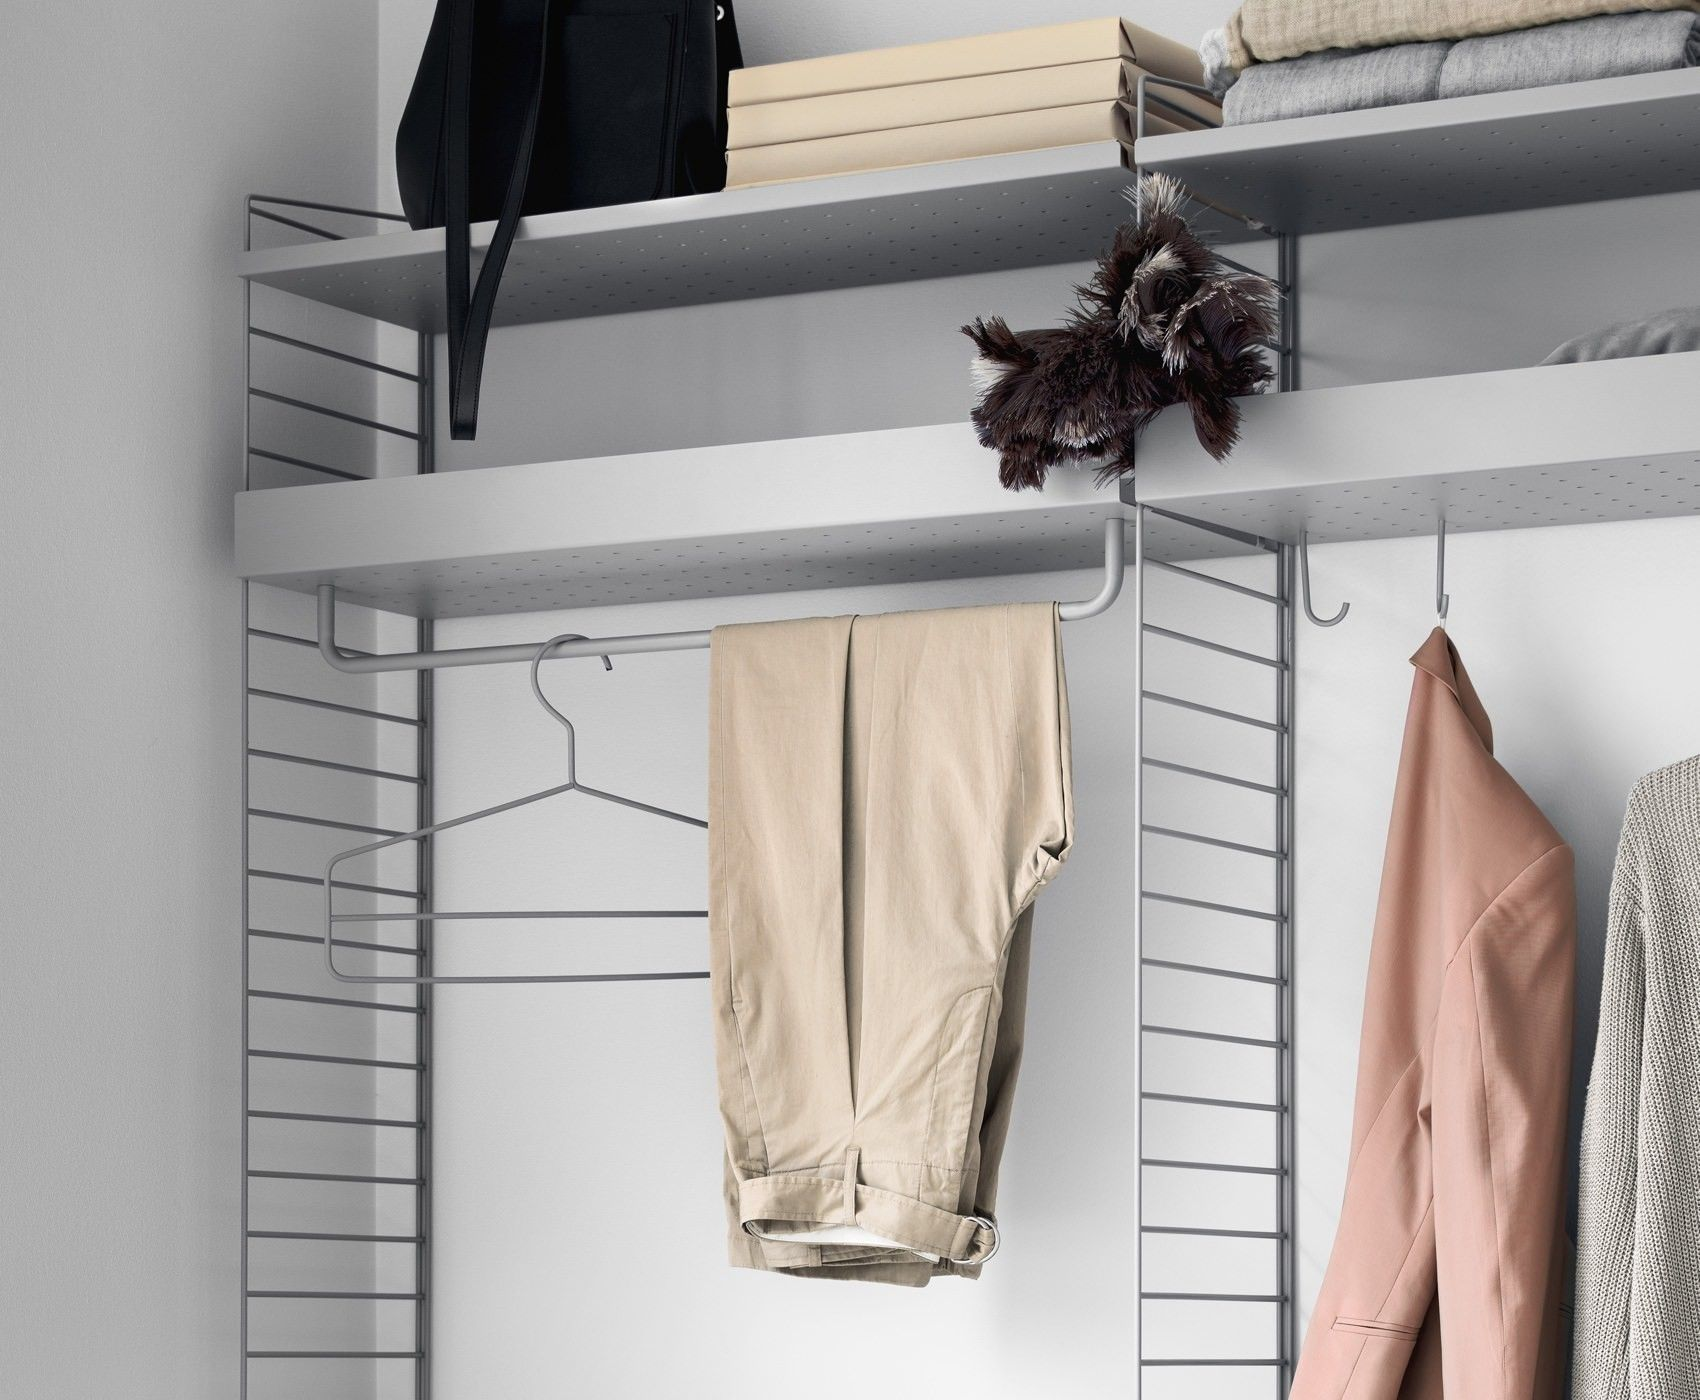 String shelving coat hanger in closet system